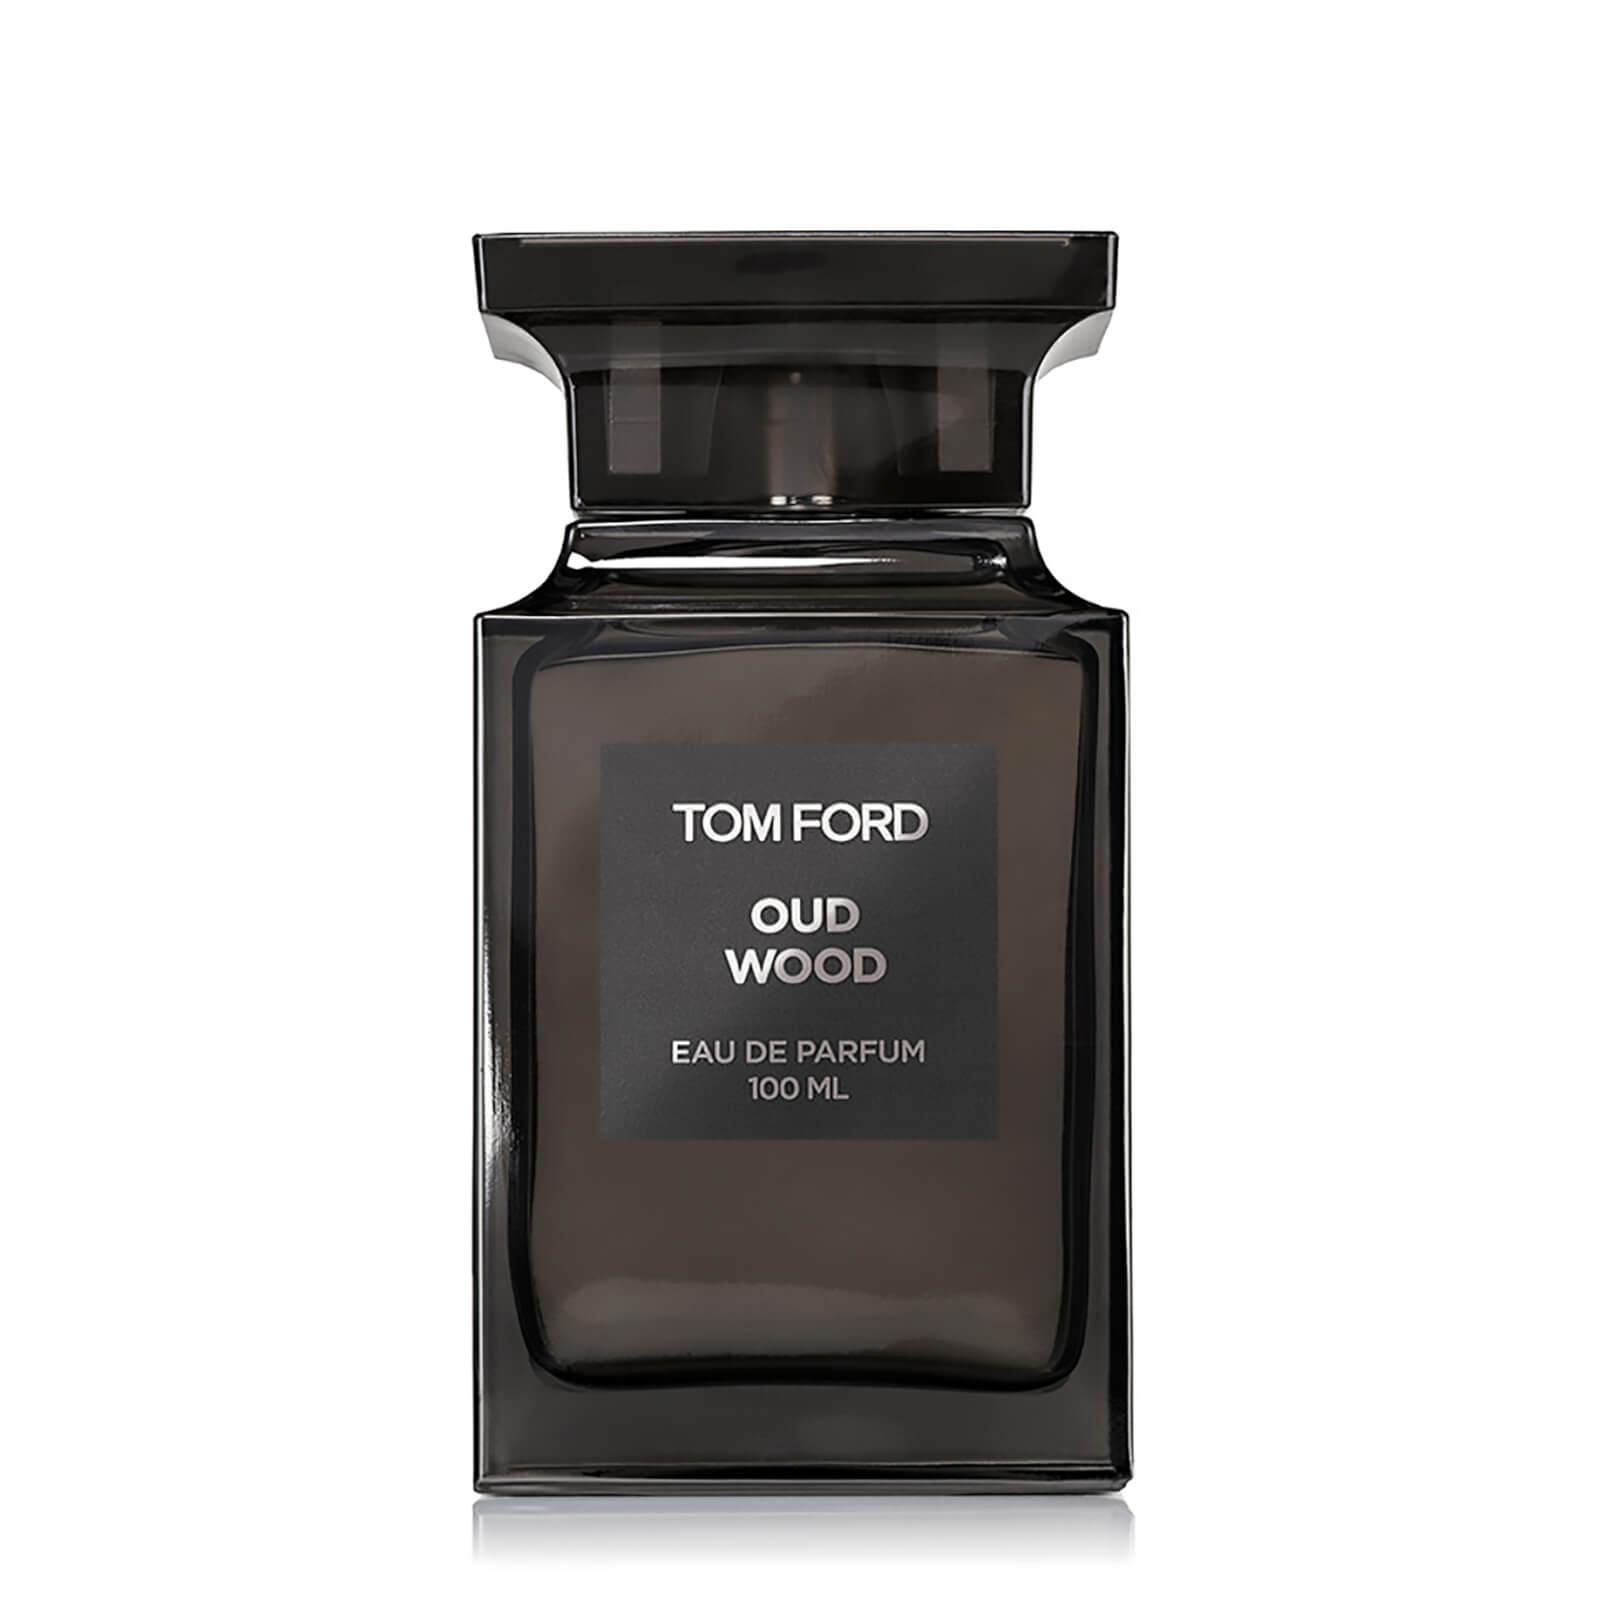 Tom Ford Oud Wood Eau de Parfum Spray (Various Sizes) - 100ml